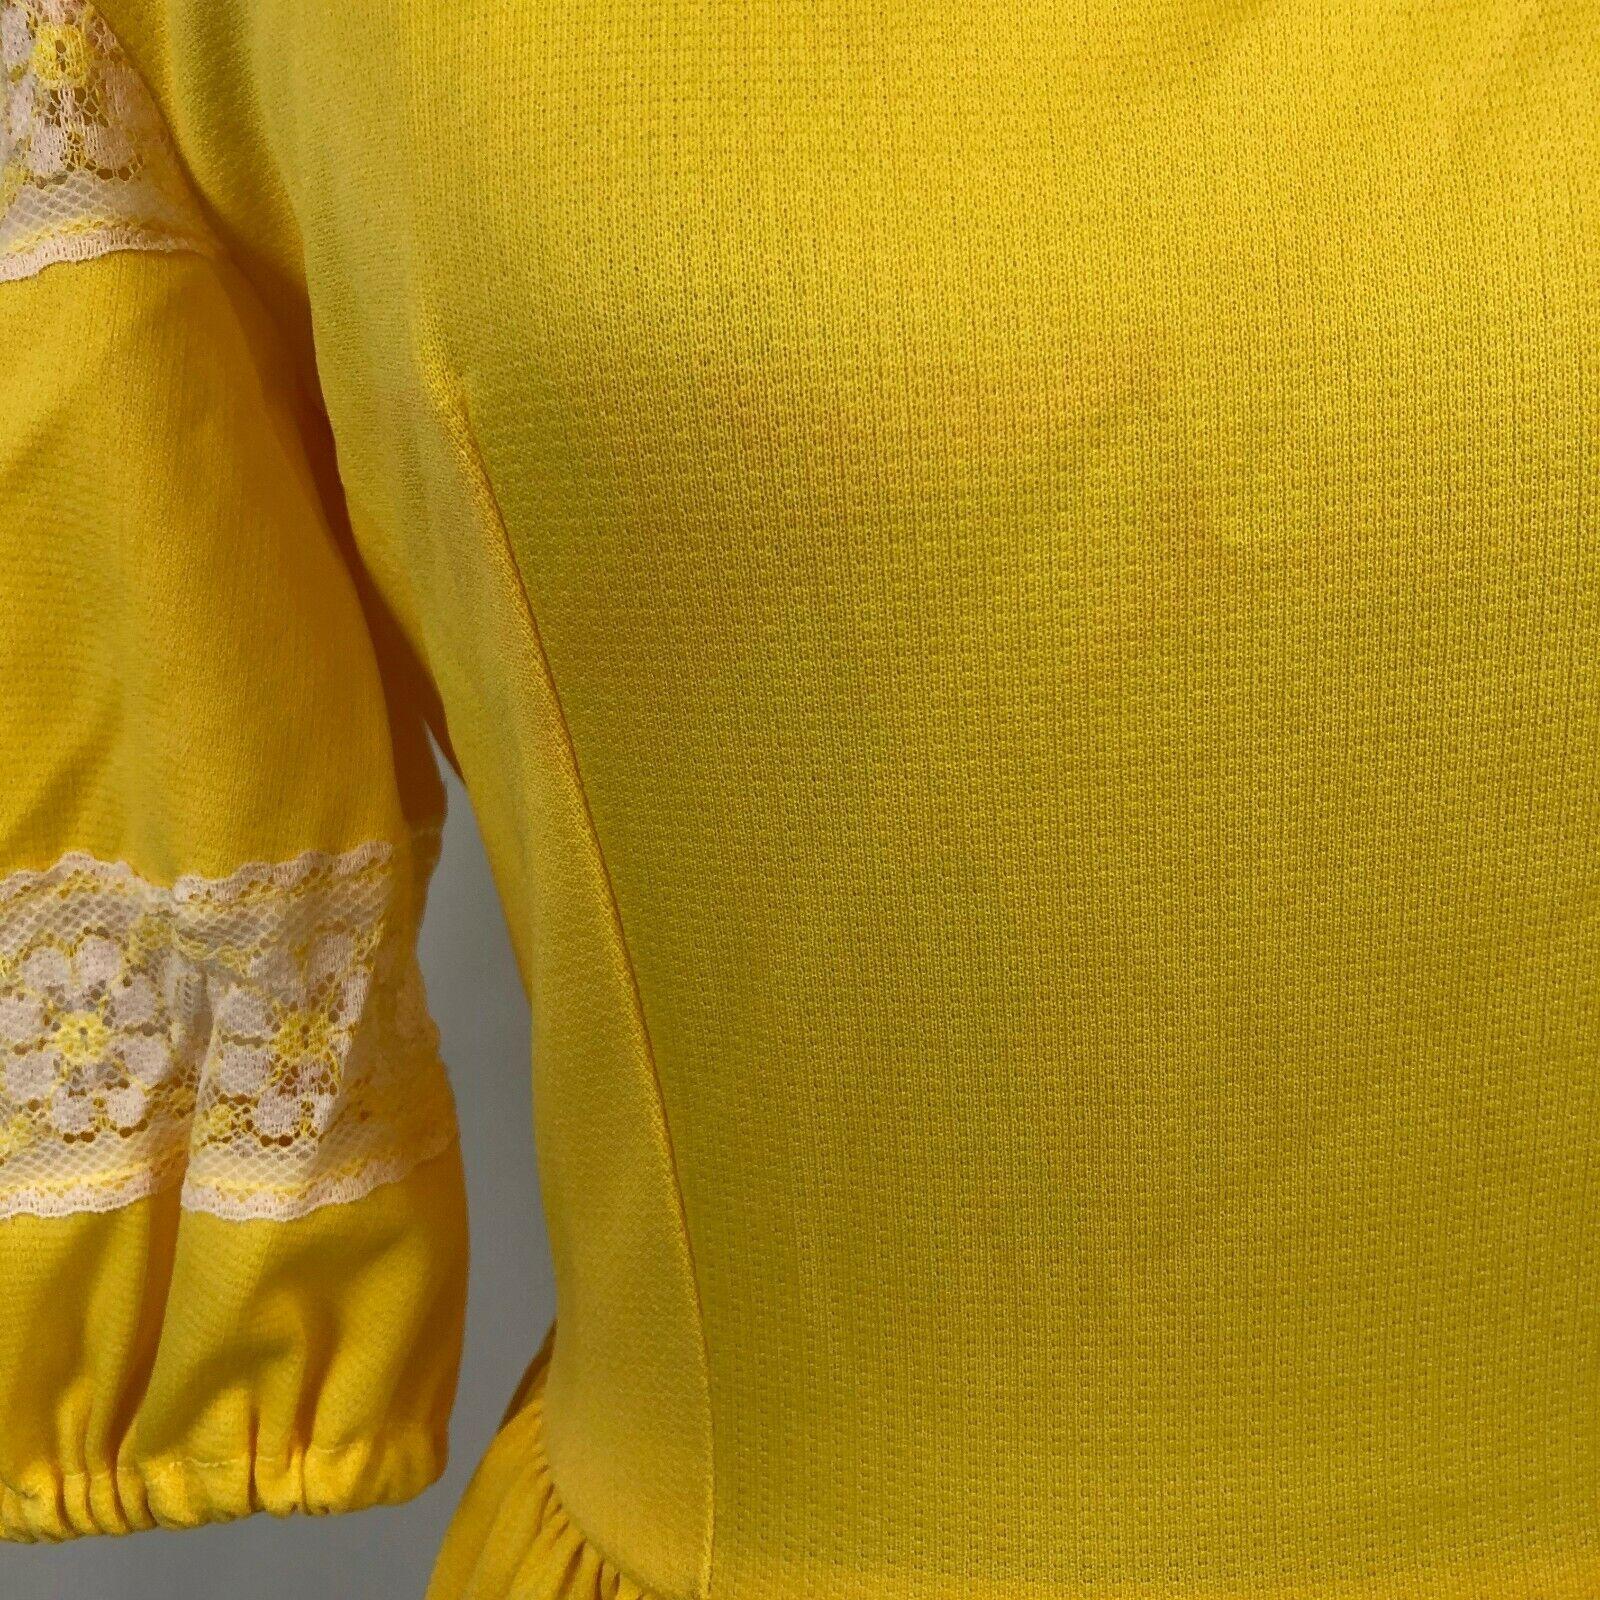 Vintage Lolita Dress Bright Yellow S/M See measur… - image 3